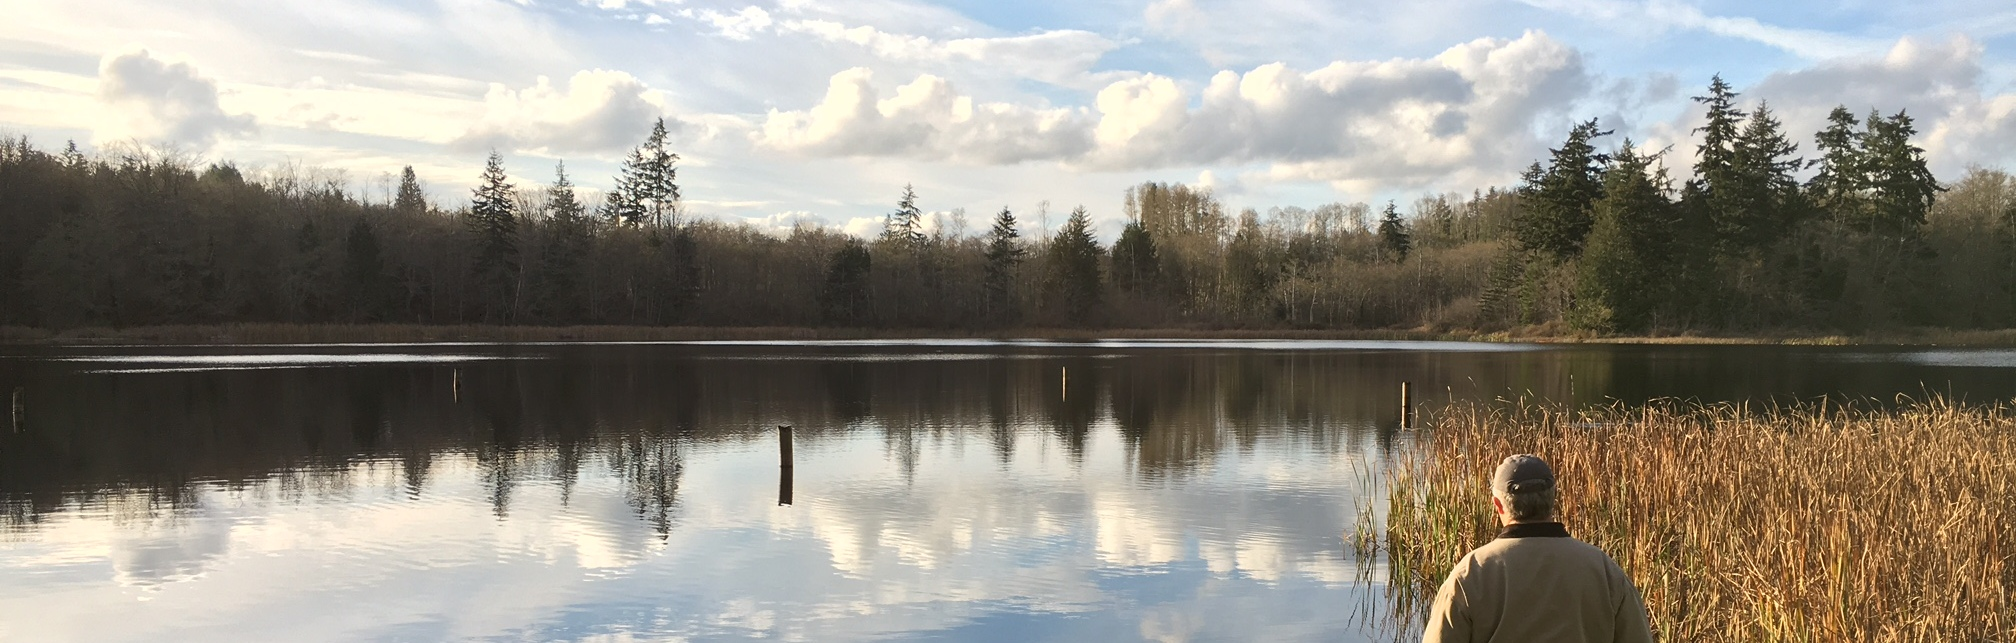 buck-lake-park